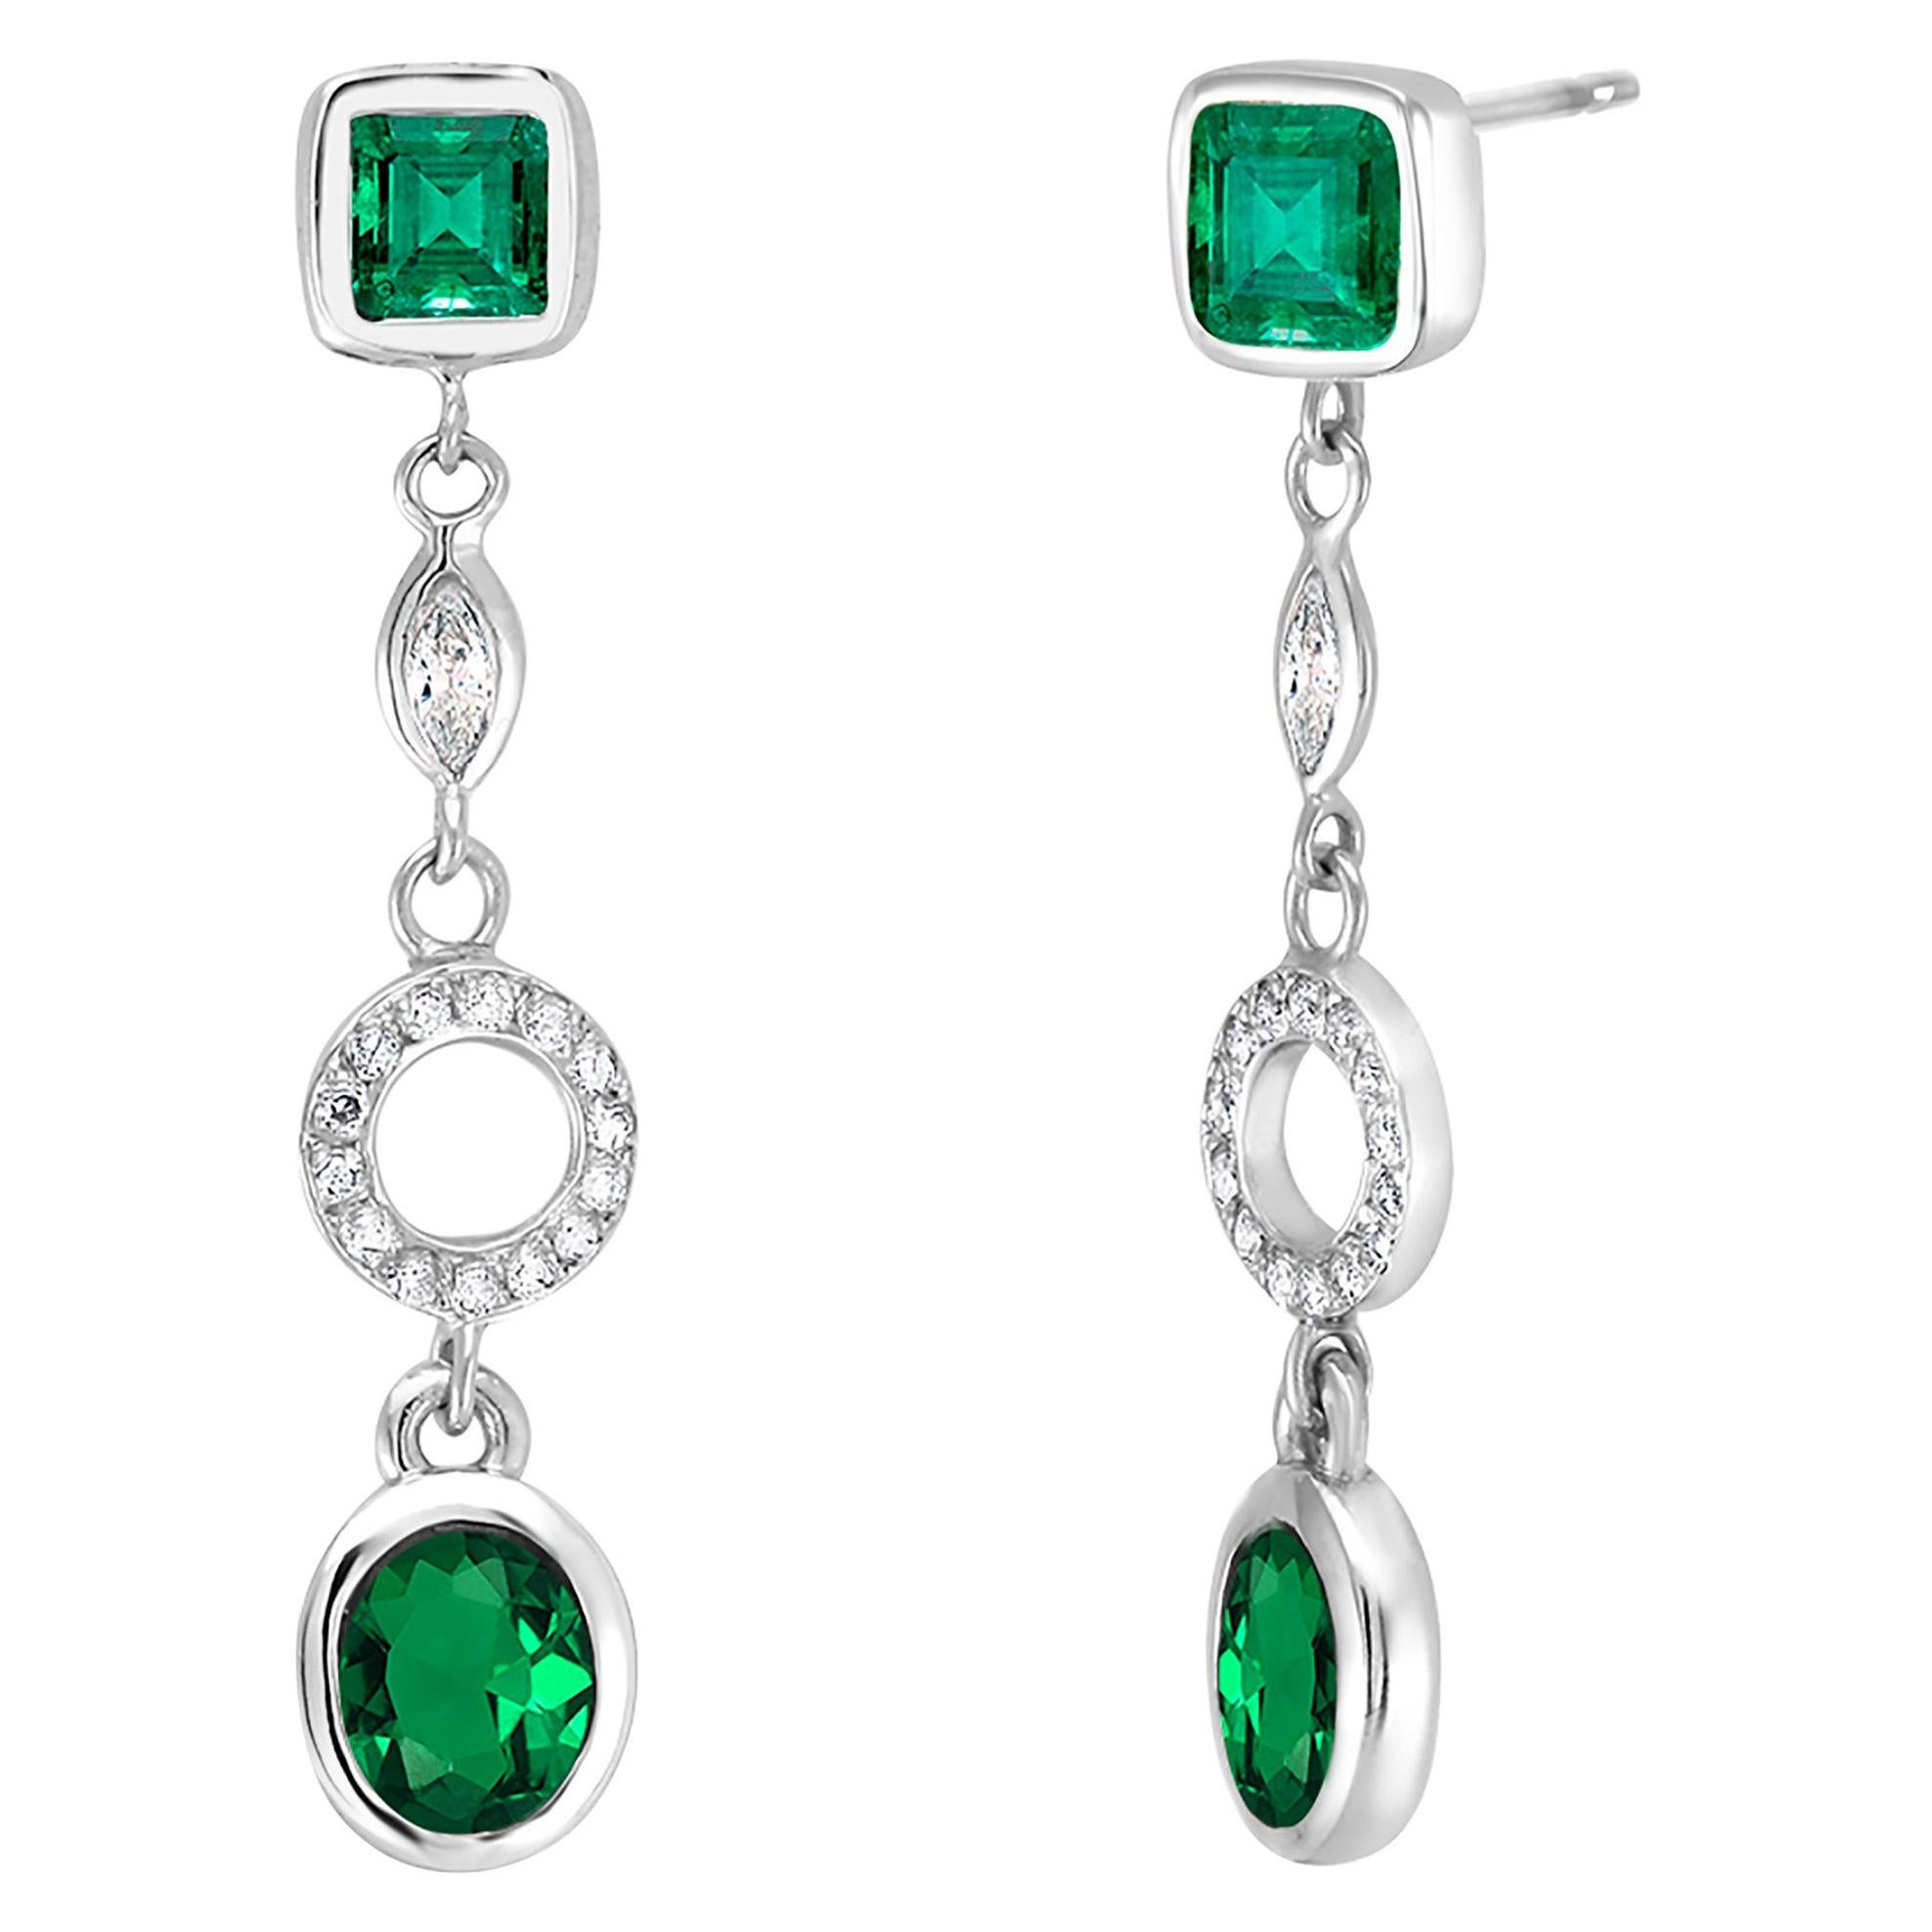 White Gold Emerald Diamond Circle Drop Earrings Weighing 3.10 Carat